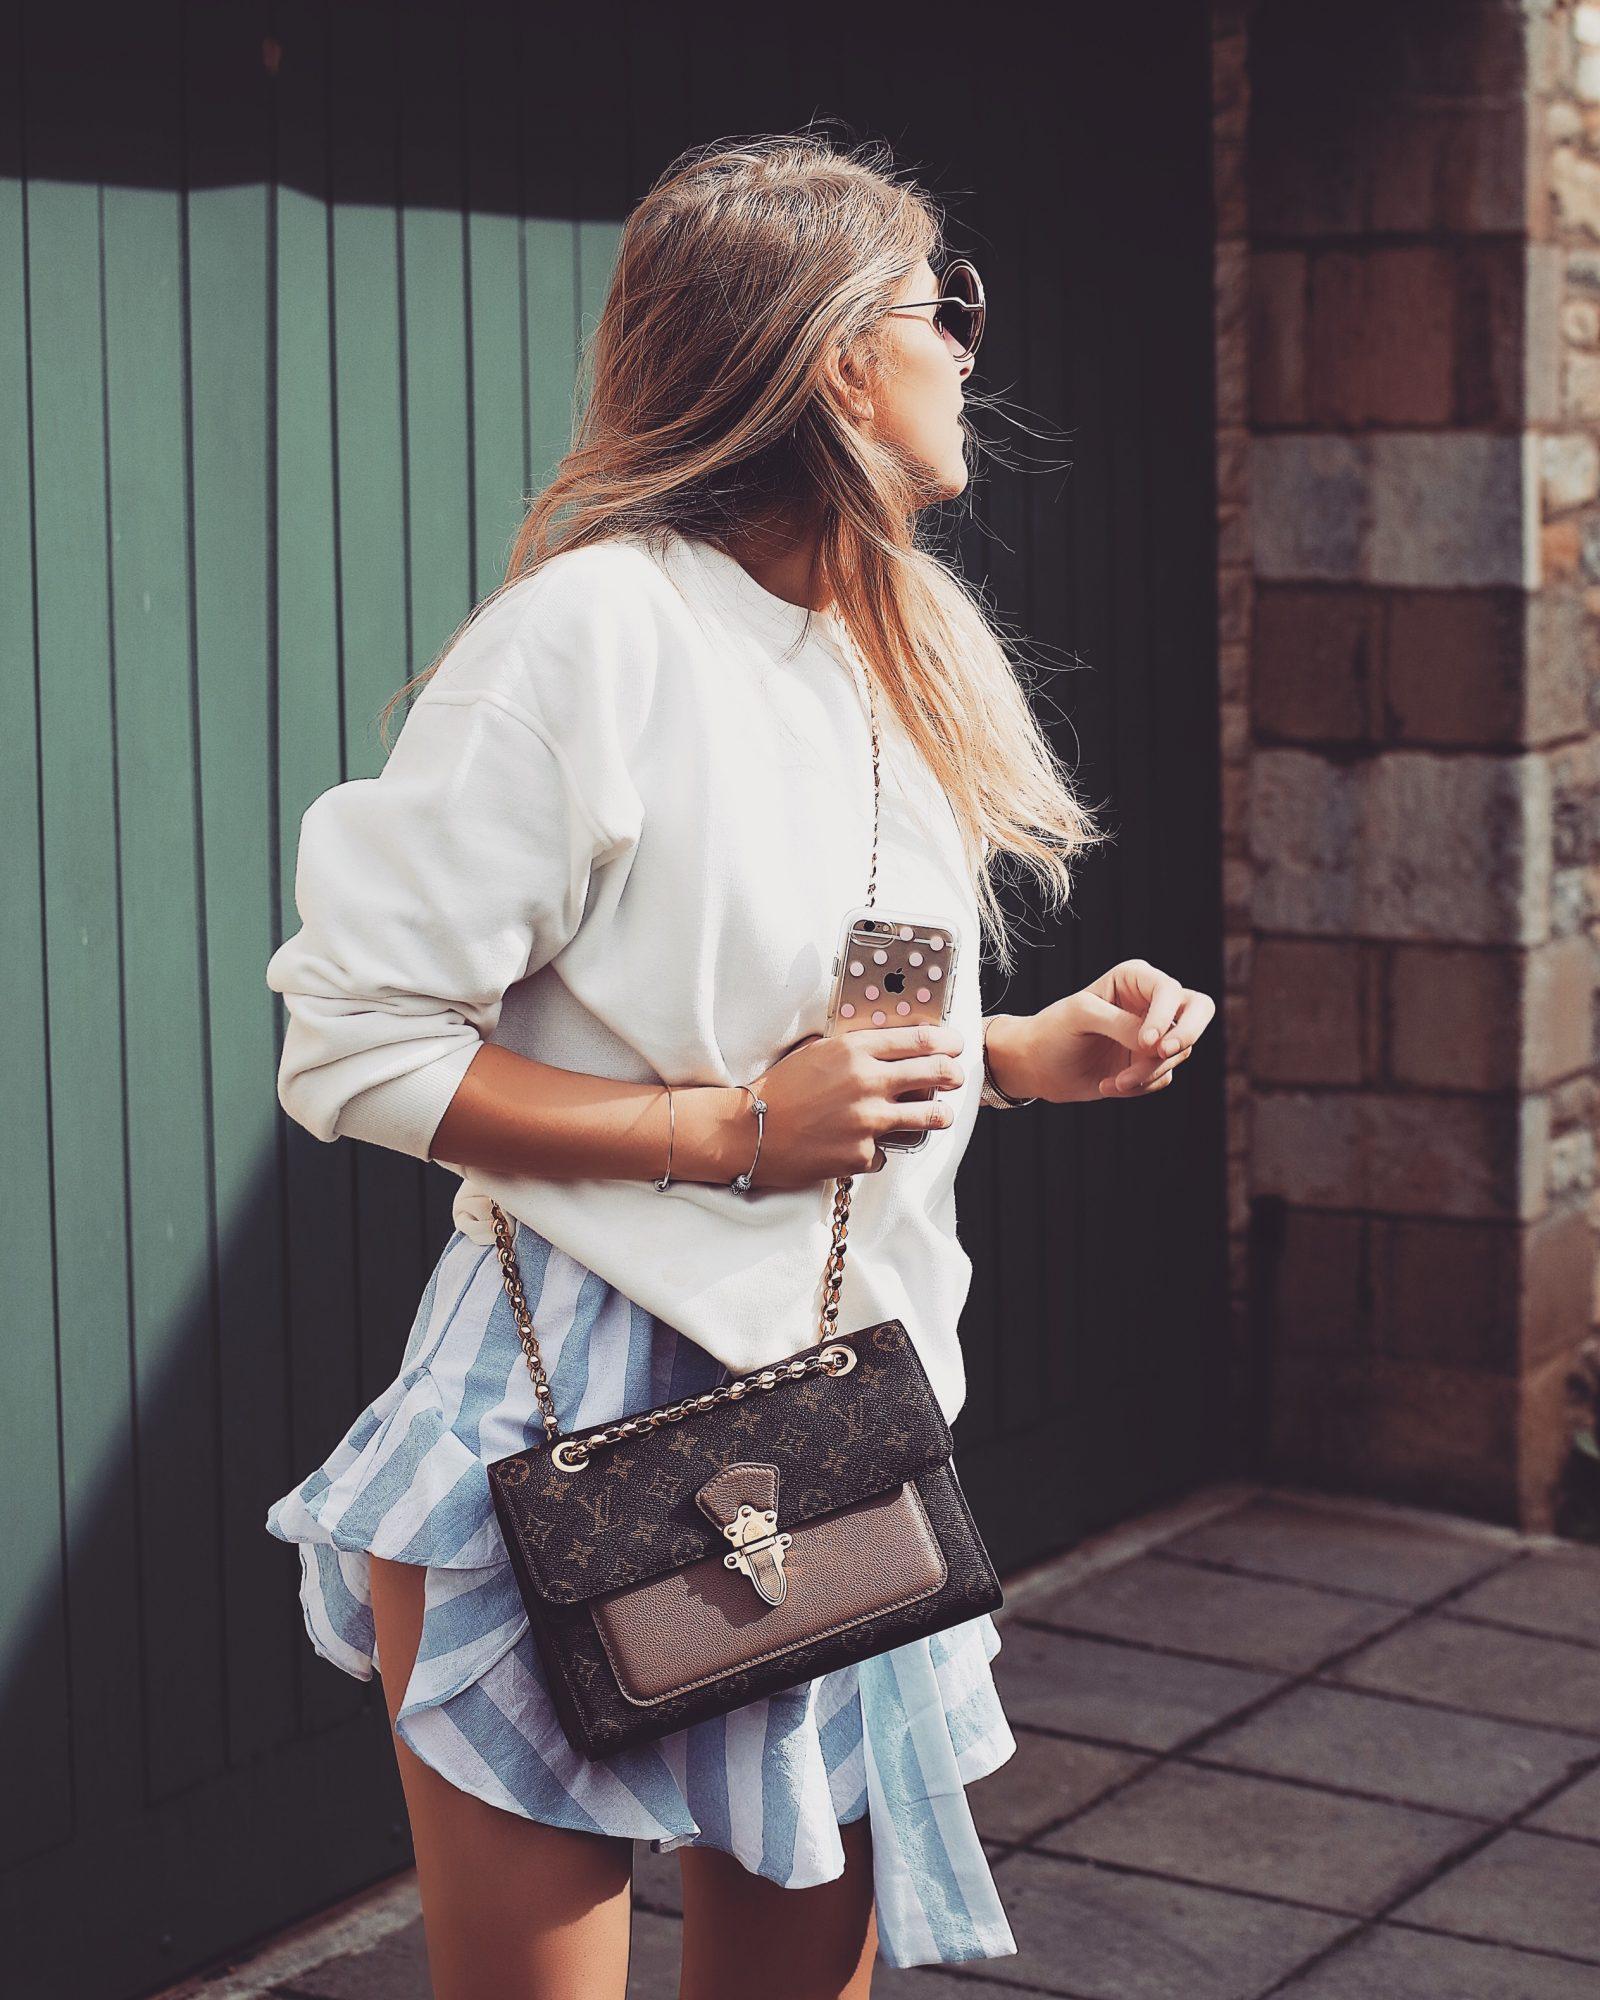 Real Time Haul - Louis Vuitton Bag, Fashion Blogger Street Style